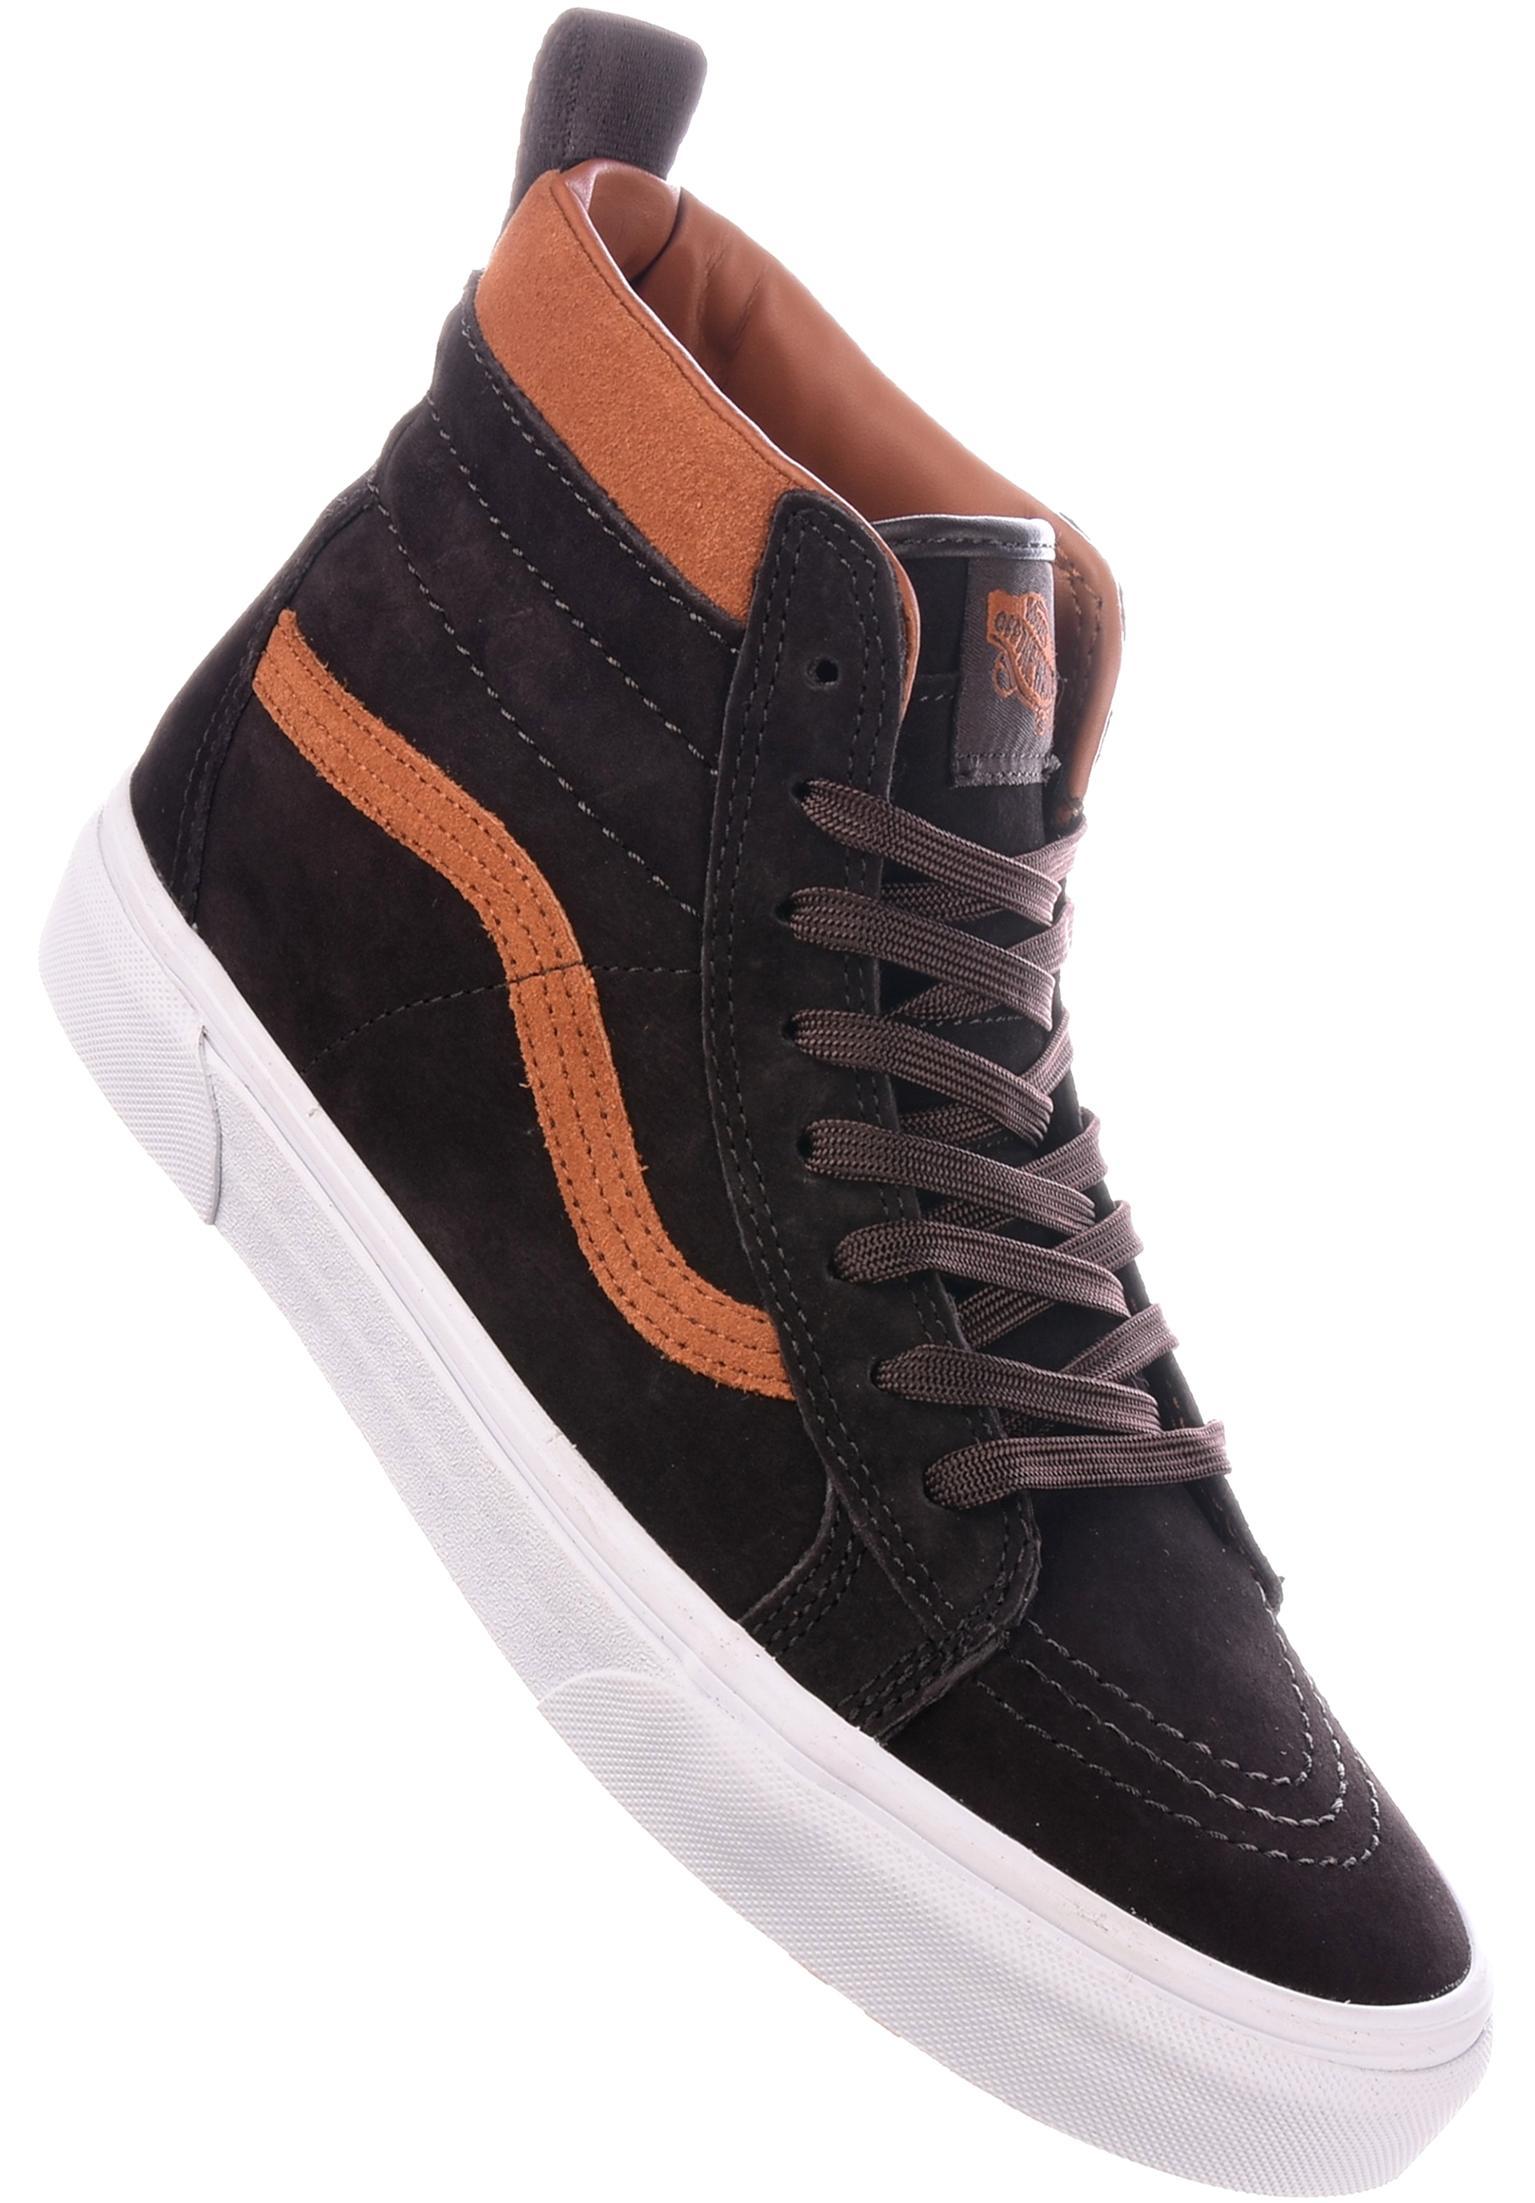 cc56ef97dc Sk8 Hi MTE Vans All Shoes in chocolate-torte for Men